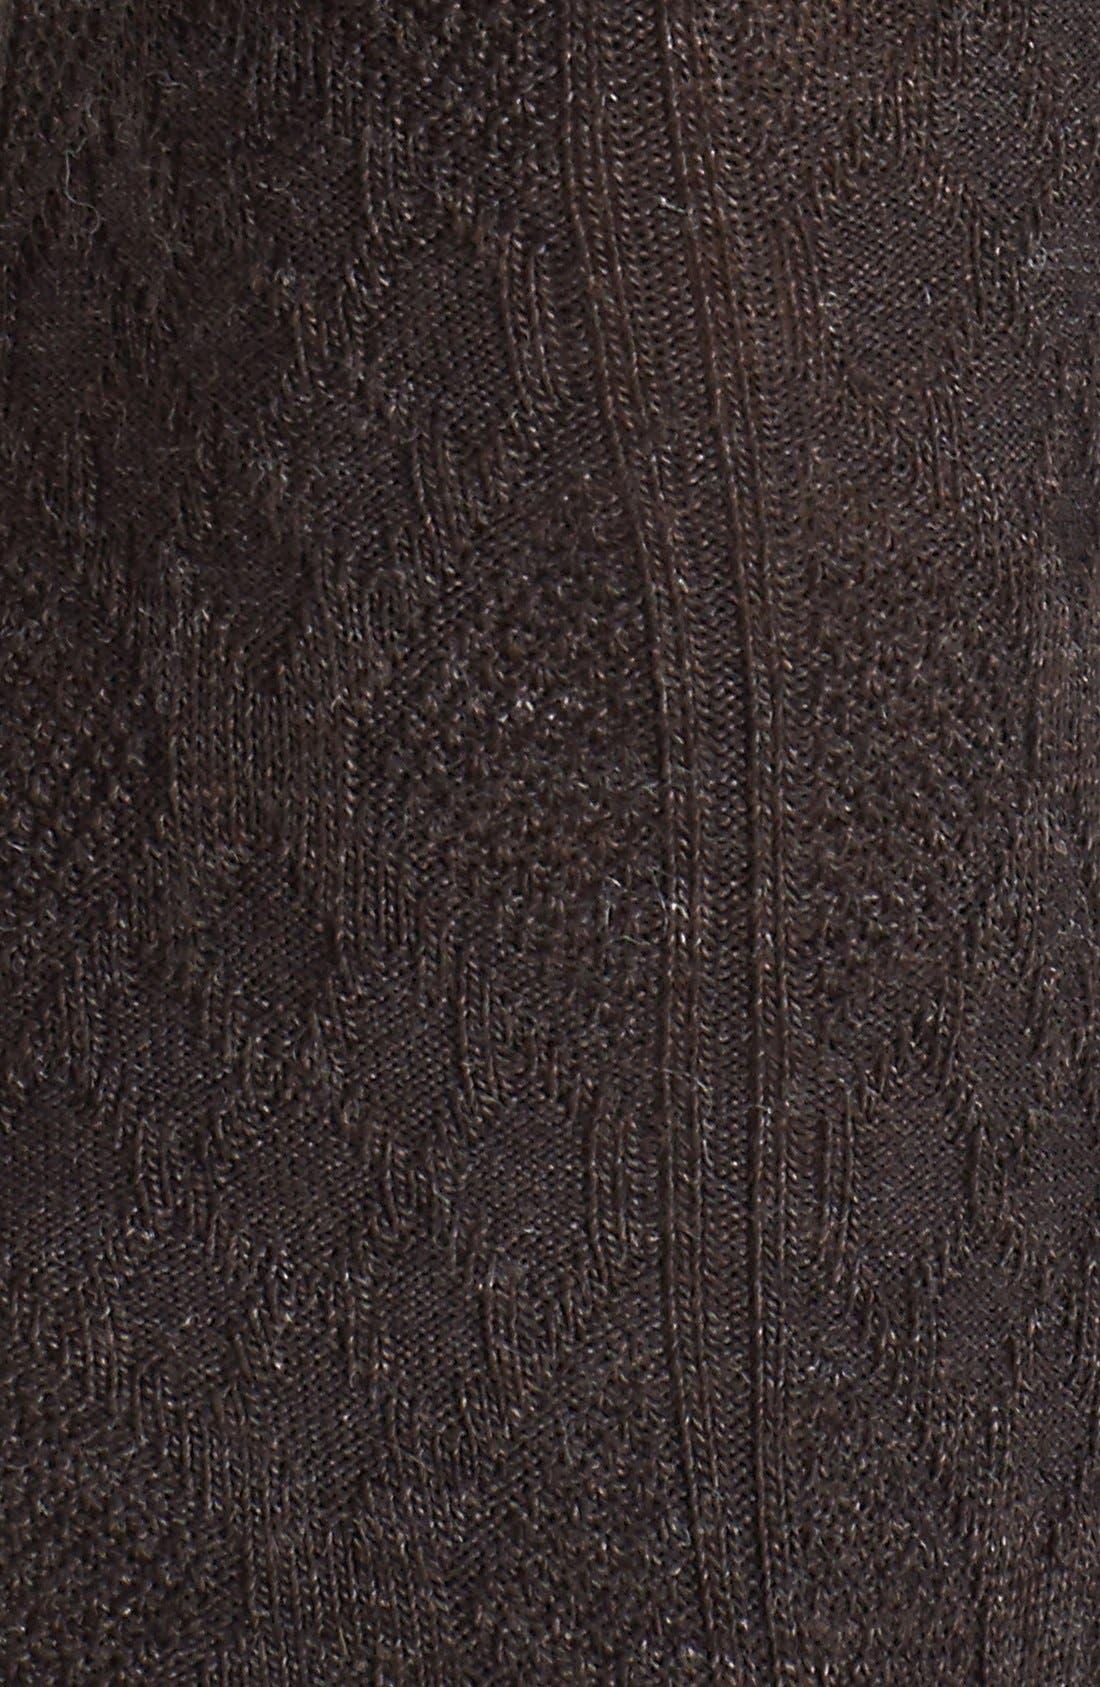 Alternate Image 2  - Smartwool 'Trellis' Wool Blend Knee Highs